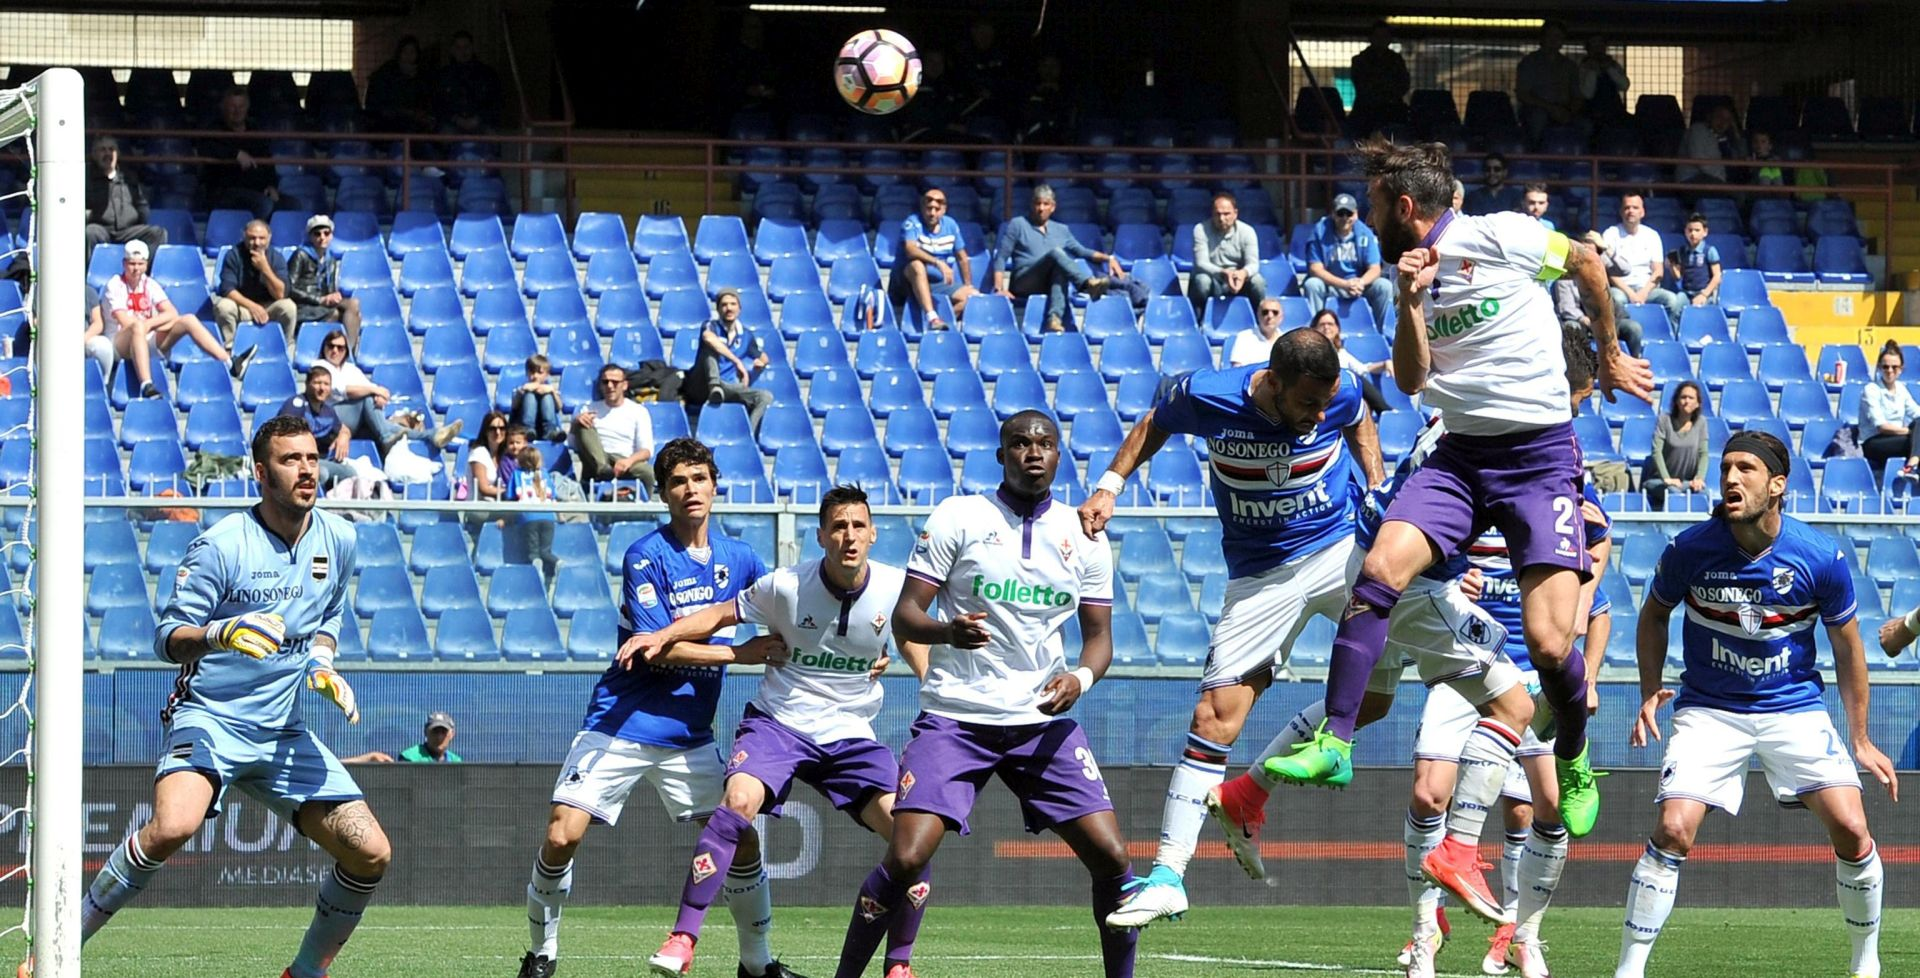 SERIE A Sampdoria i Fiorentina remizirali, nastupili Badelj, Milić i Kalinić